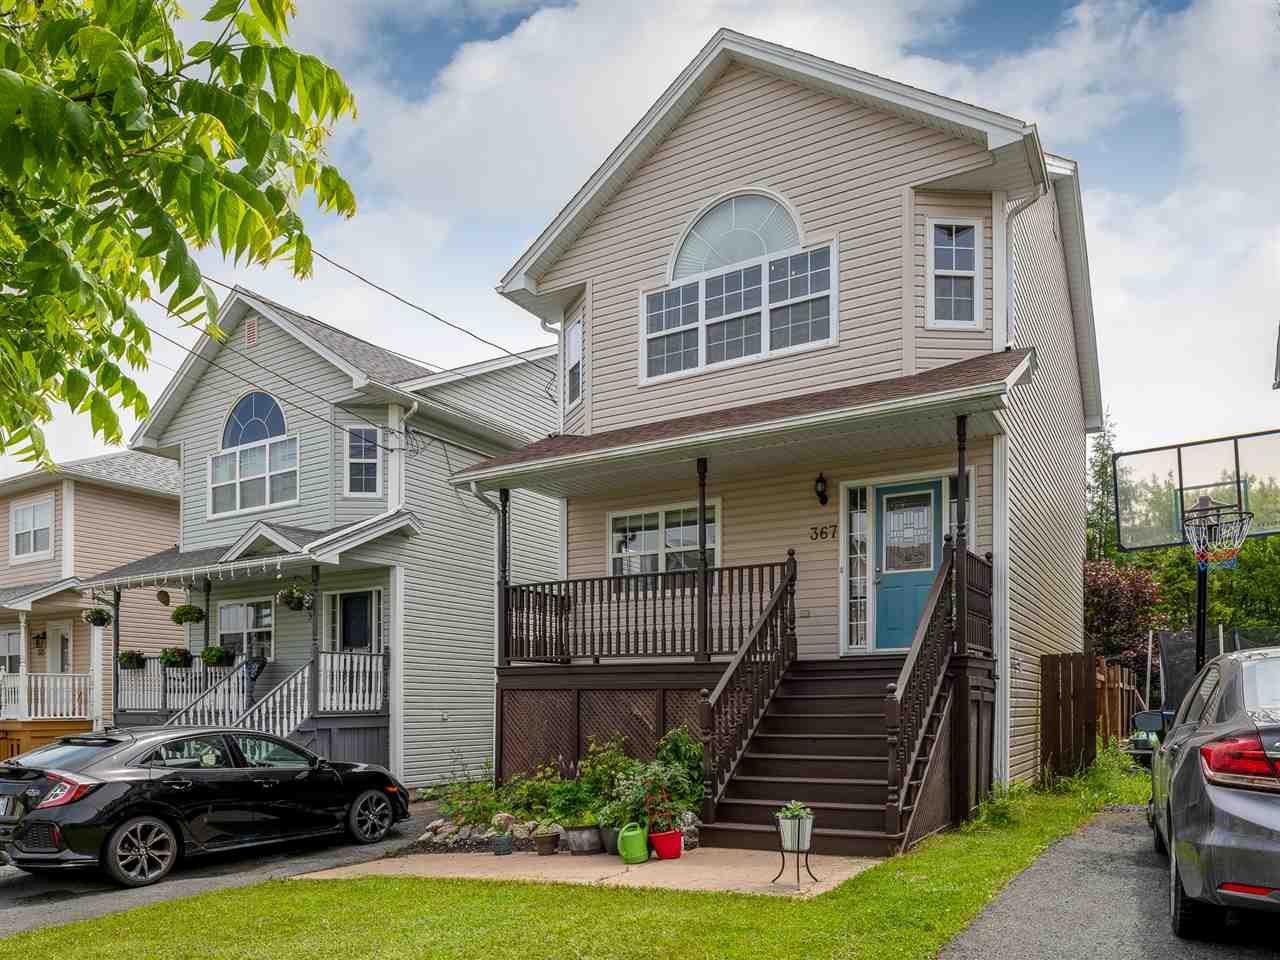 Main Photo: 367 Sheppards Run in Beechville: 40-Timberlea, Prospect, St. Margaret`S Bay Residential for sale (Halifax-Dartmouth)  : MLS®# 202011465